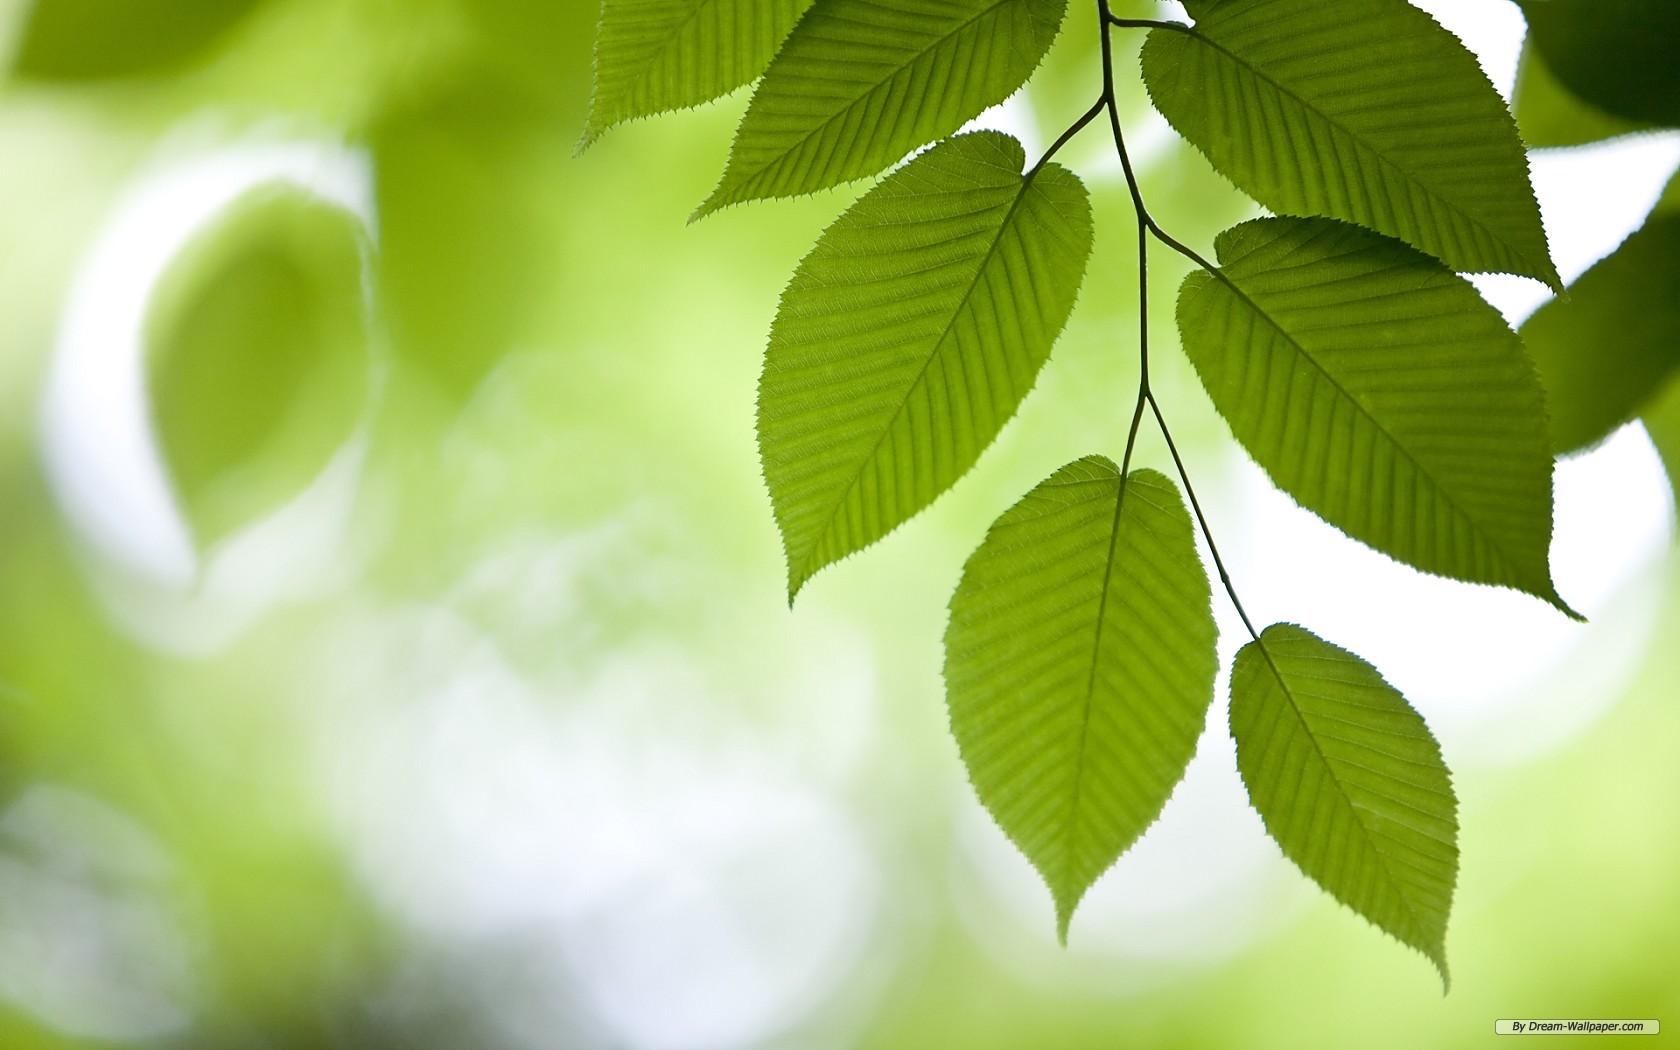 Free Nature Wallpaper - Windows 7 Green Leaf - HD Wallpaper